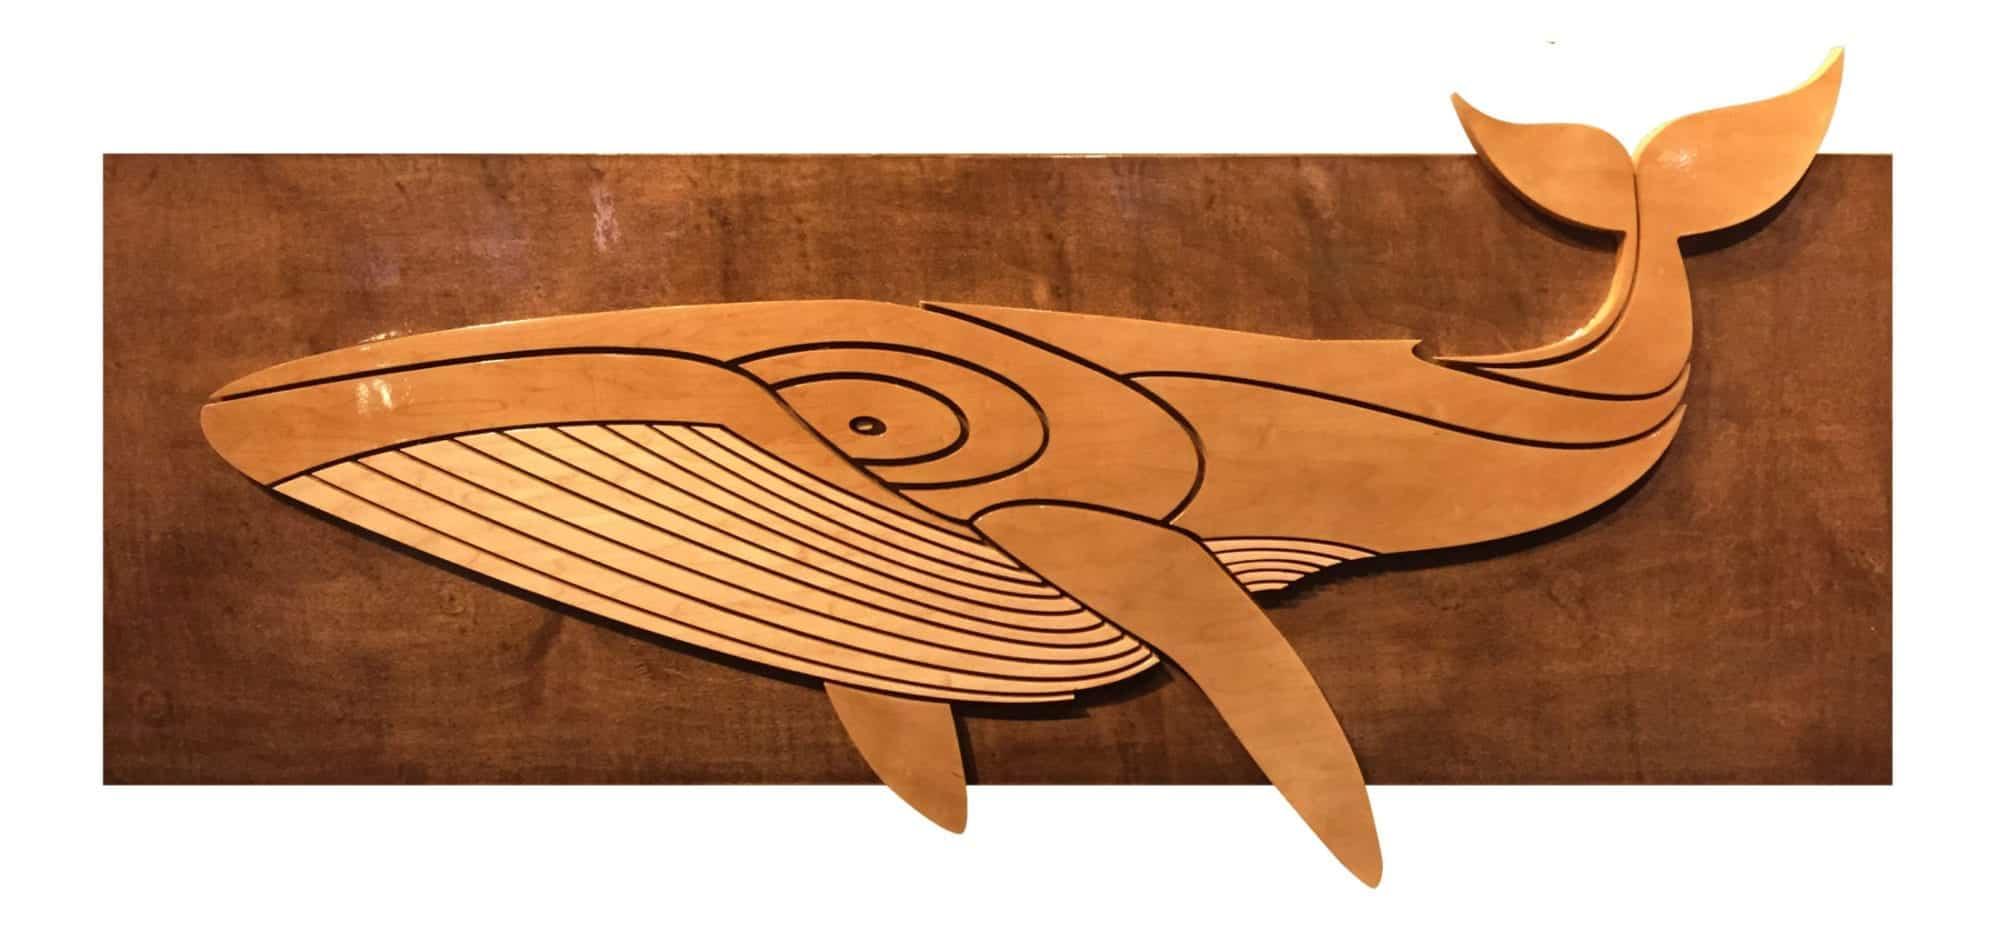 ocean gallery - wooden whale - Thomas Studios